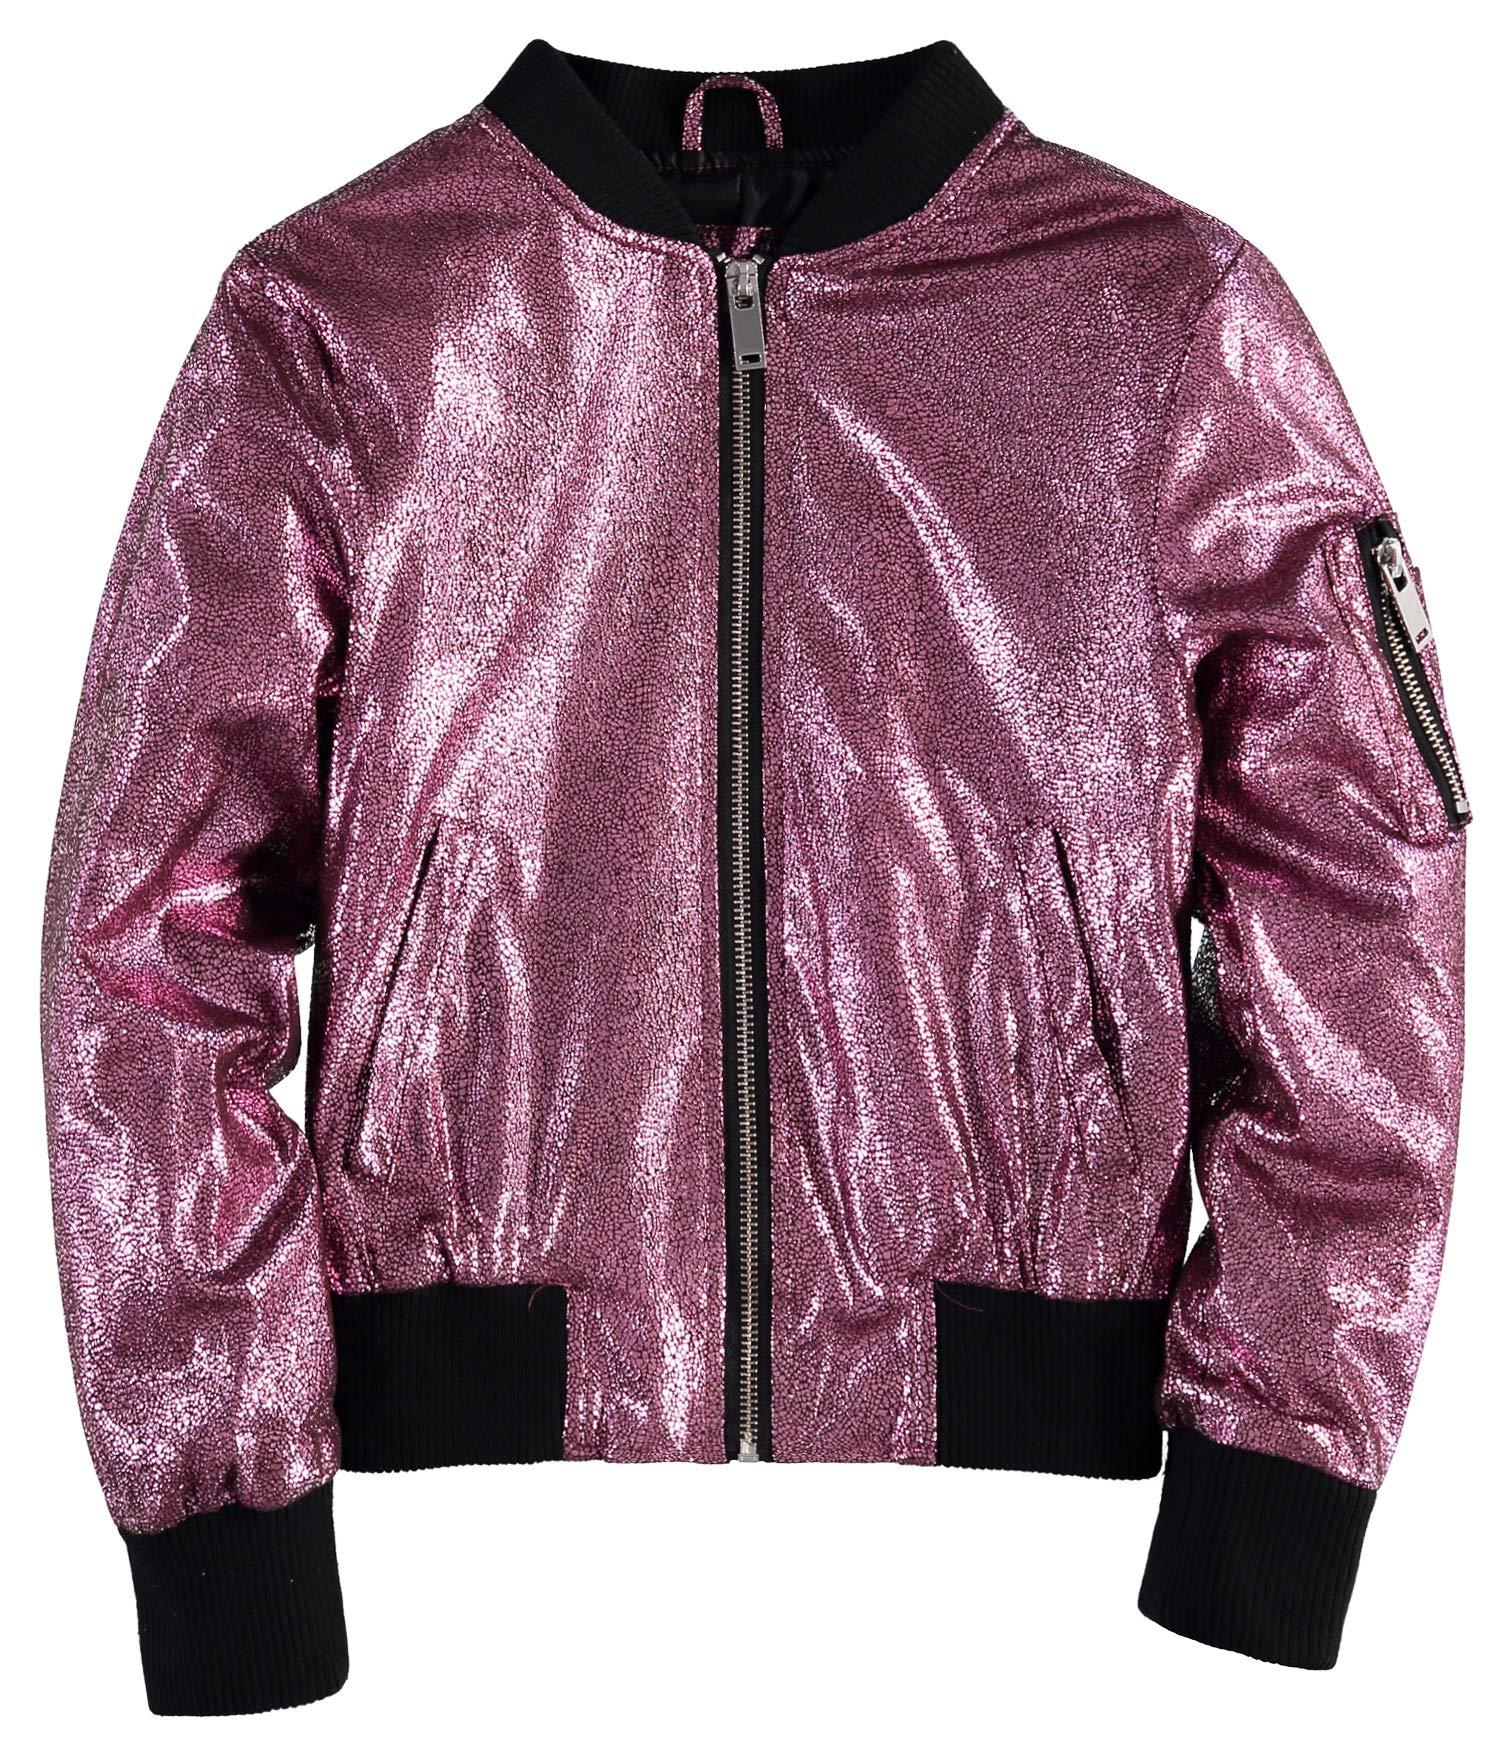 Urban Republic Girls' Metallic Glitter Bomber Jacket (Light Pink, 10-12)